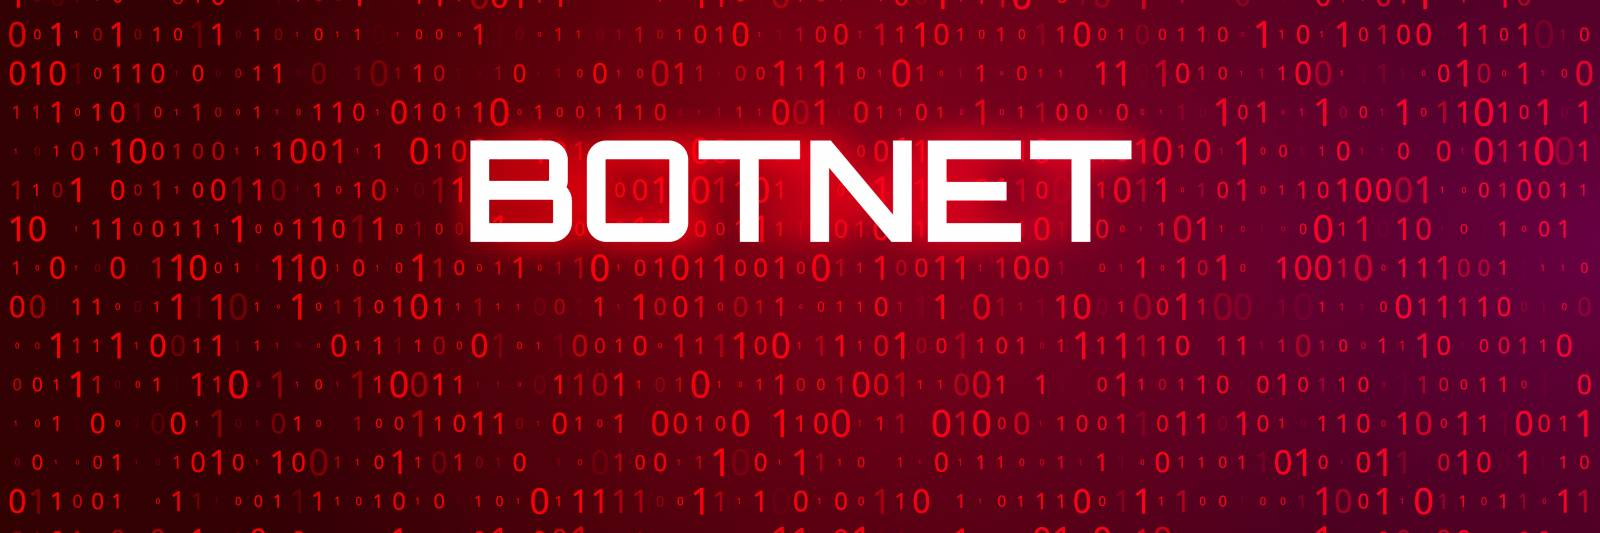 botnet targets vulnerable microsoft exchange servers